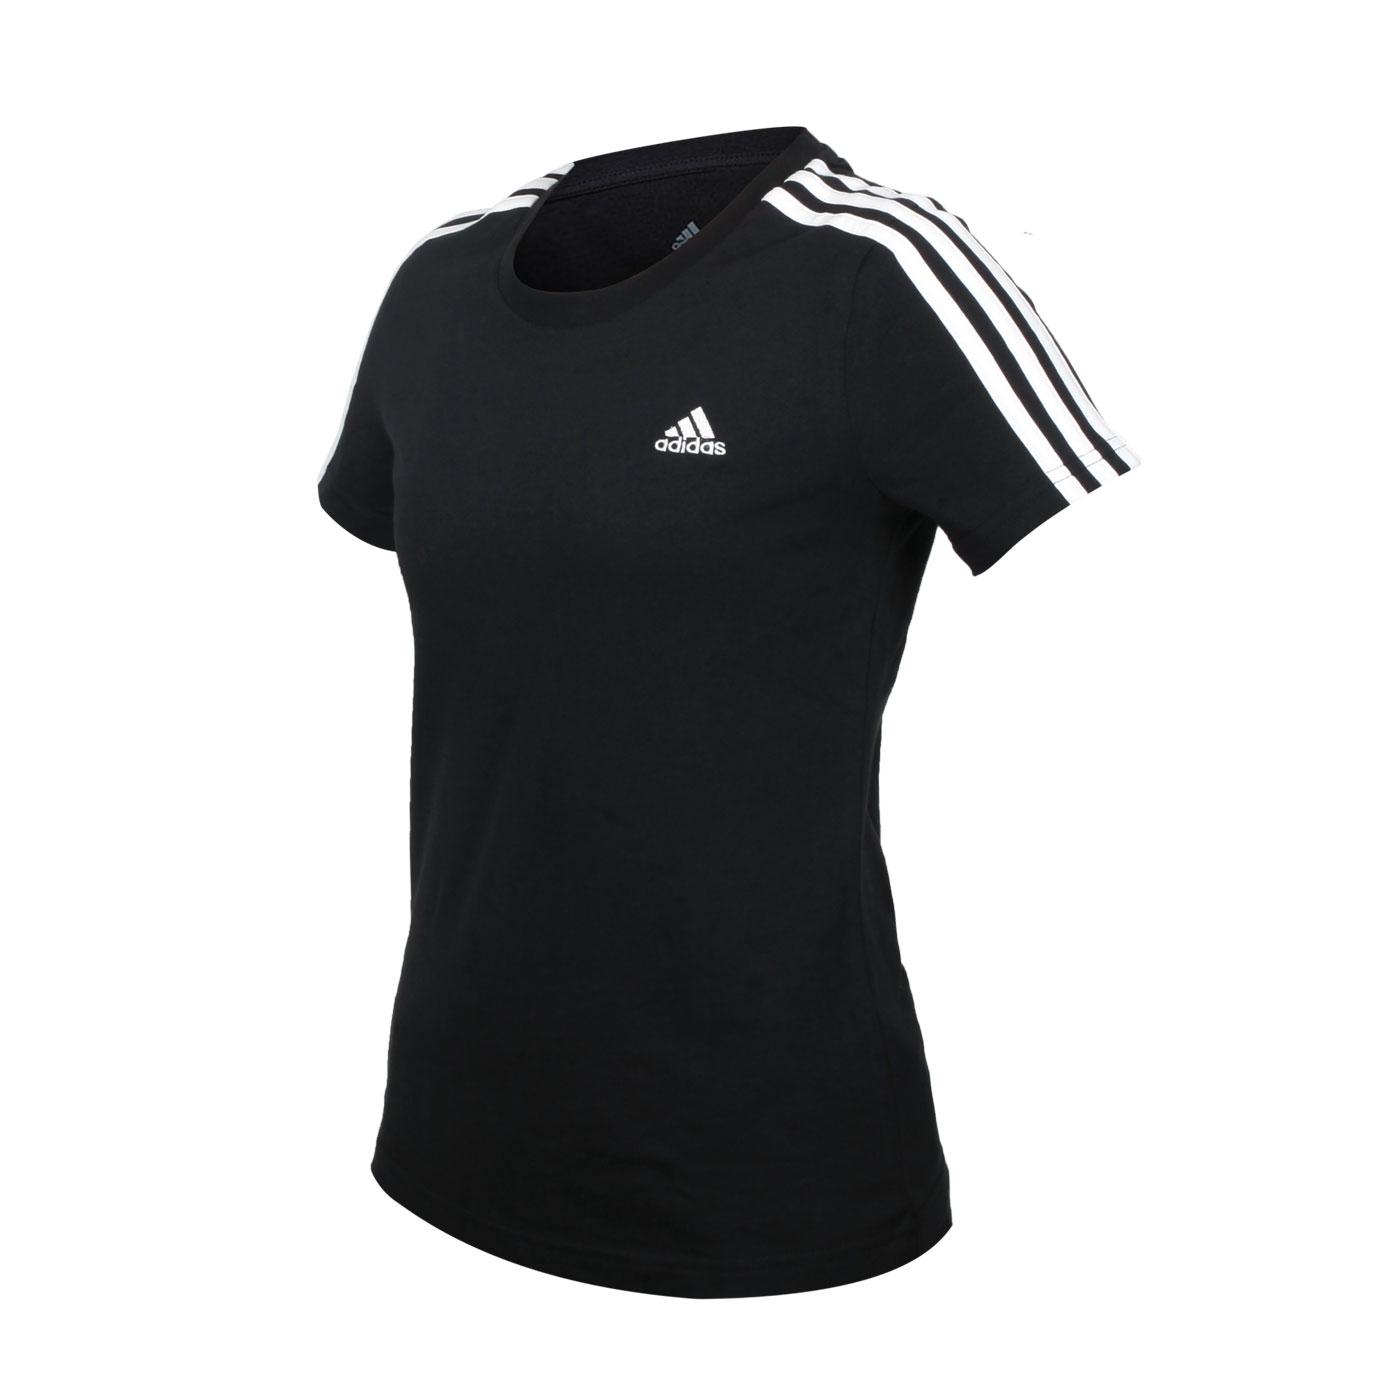 ADIDAS 女款短袖T恤 GL0784 - 黑白